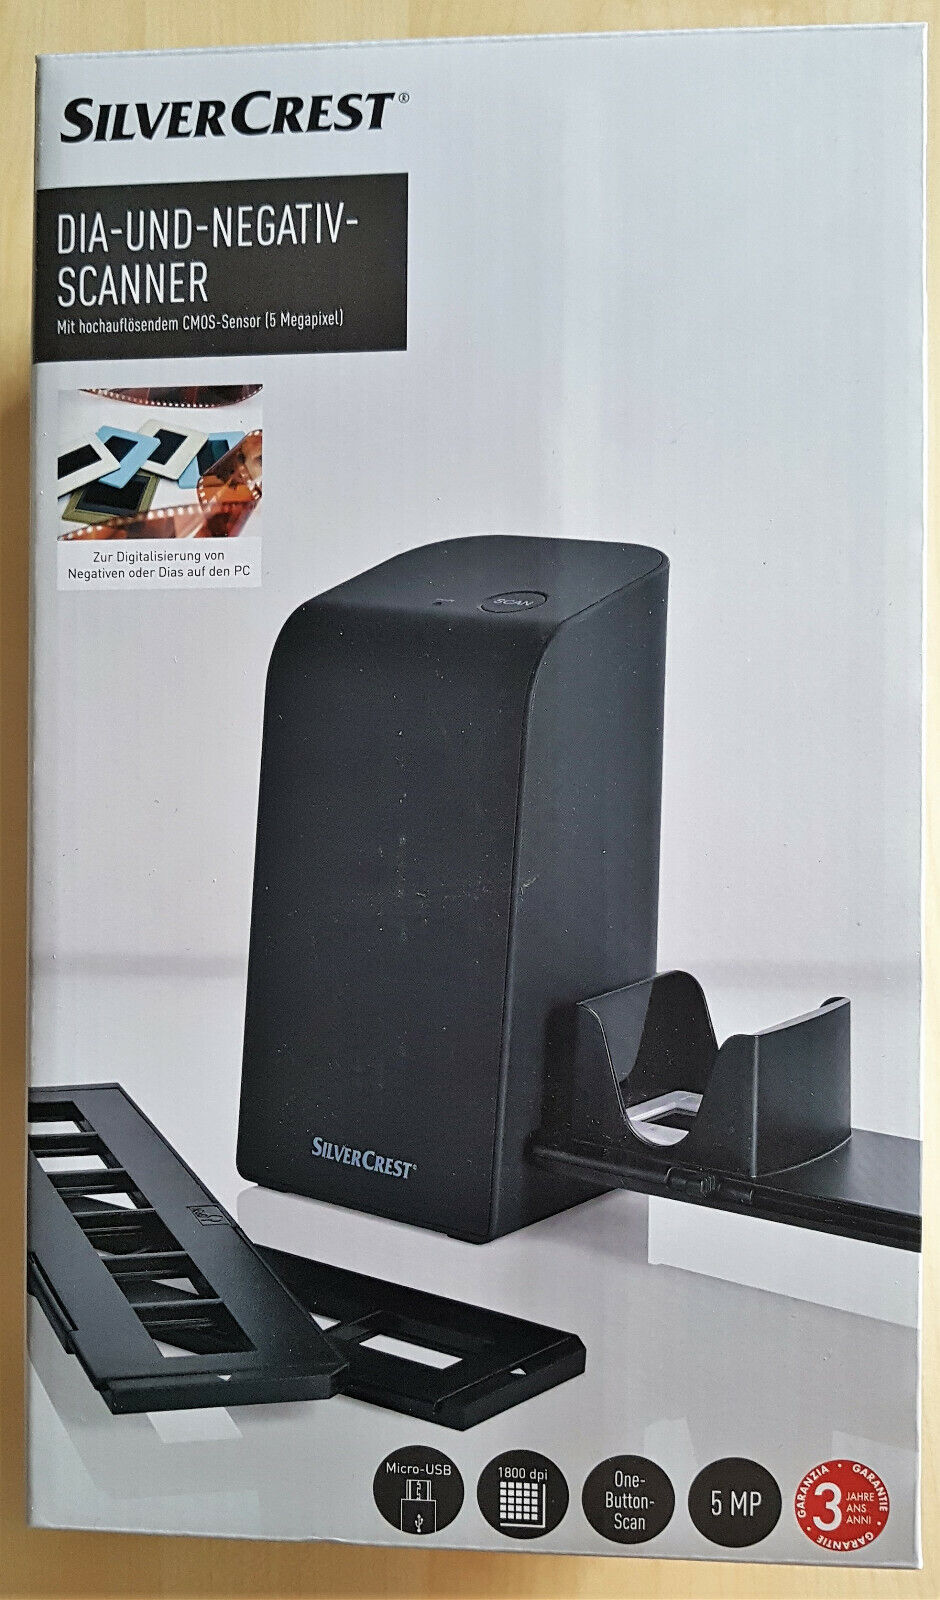 Diascanner und Negativscanner, SilverCrest SND 3600 D3